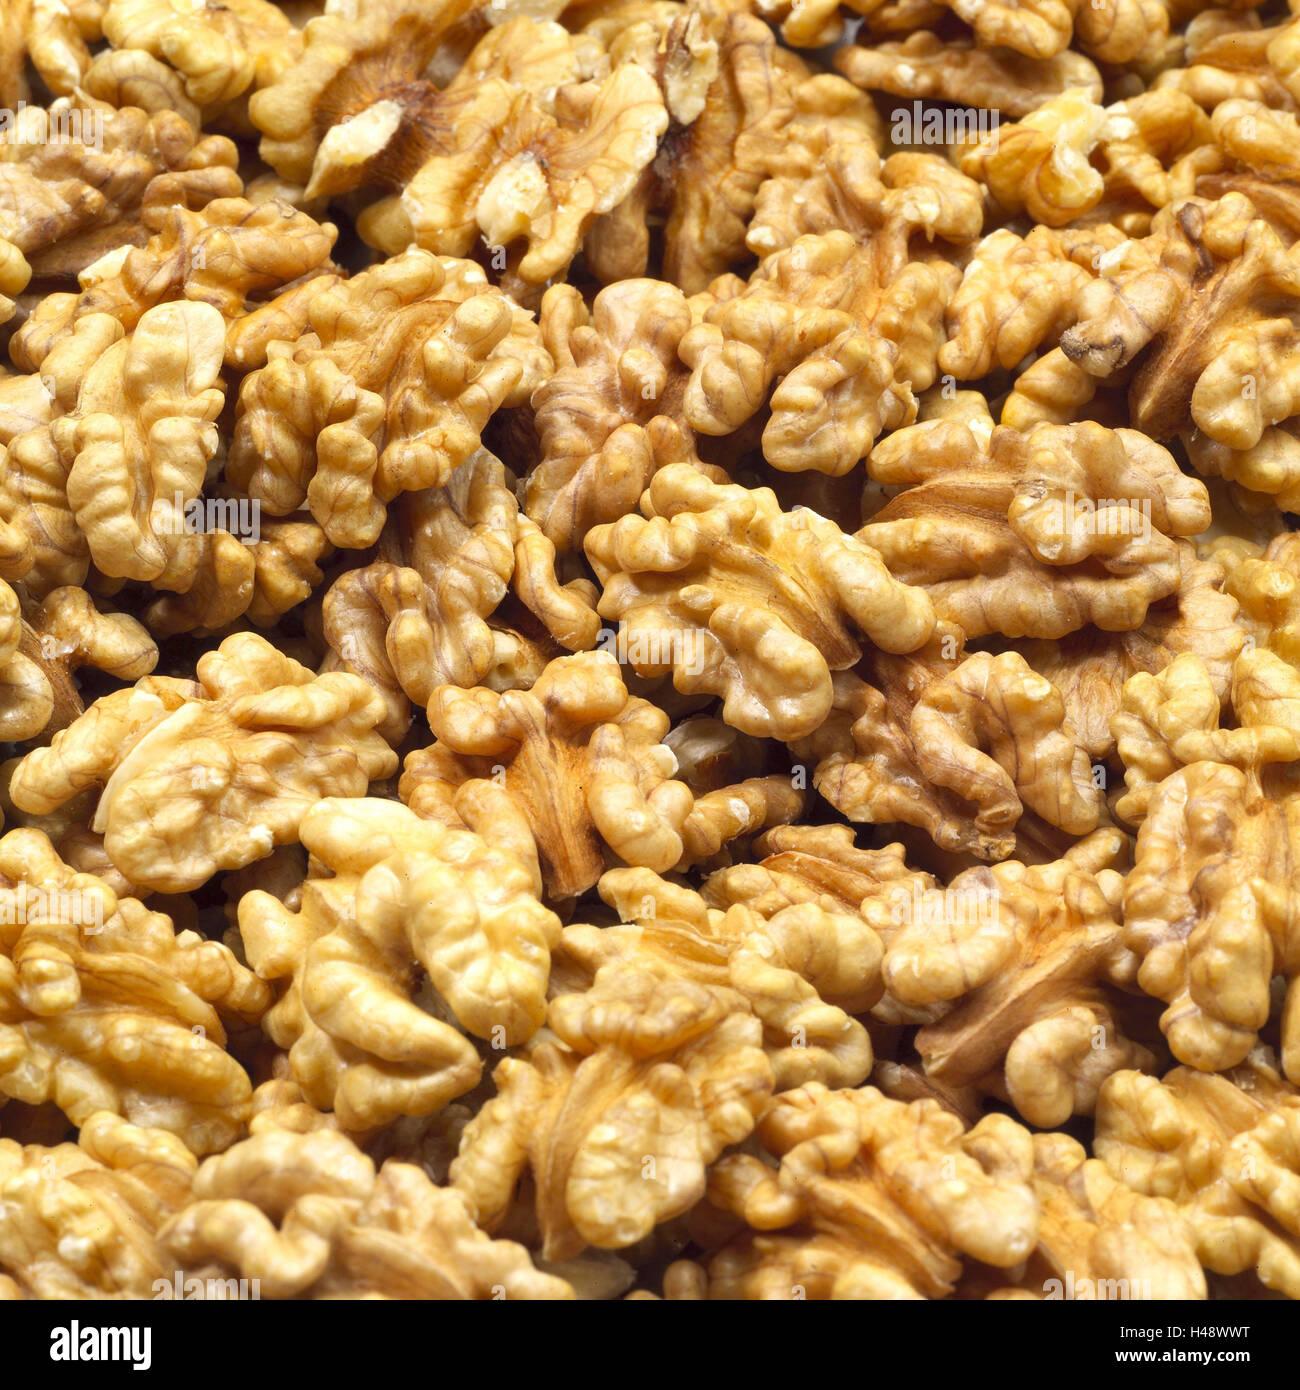 Walnut cores, Stock Photo